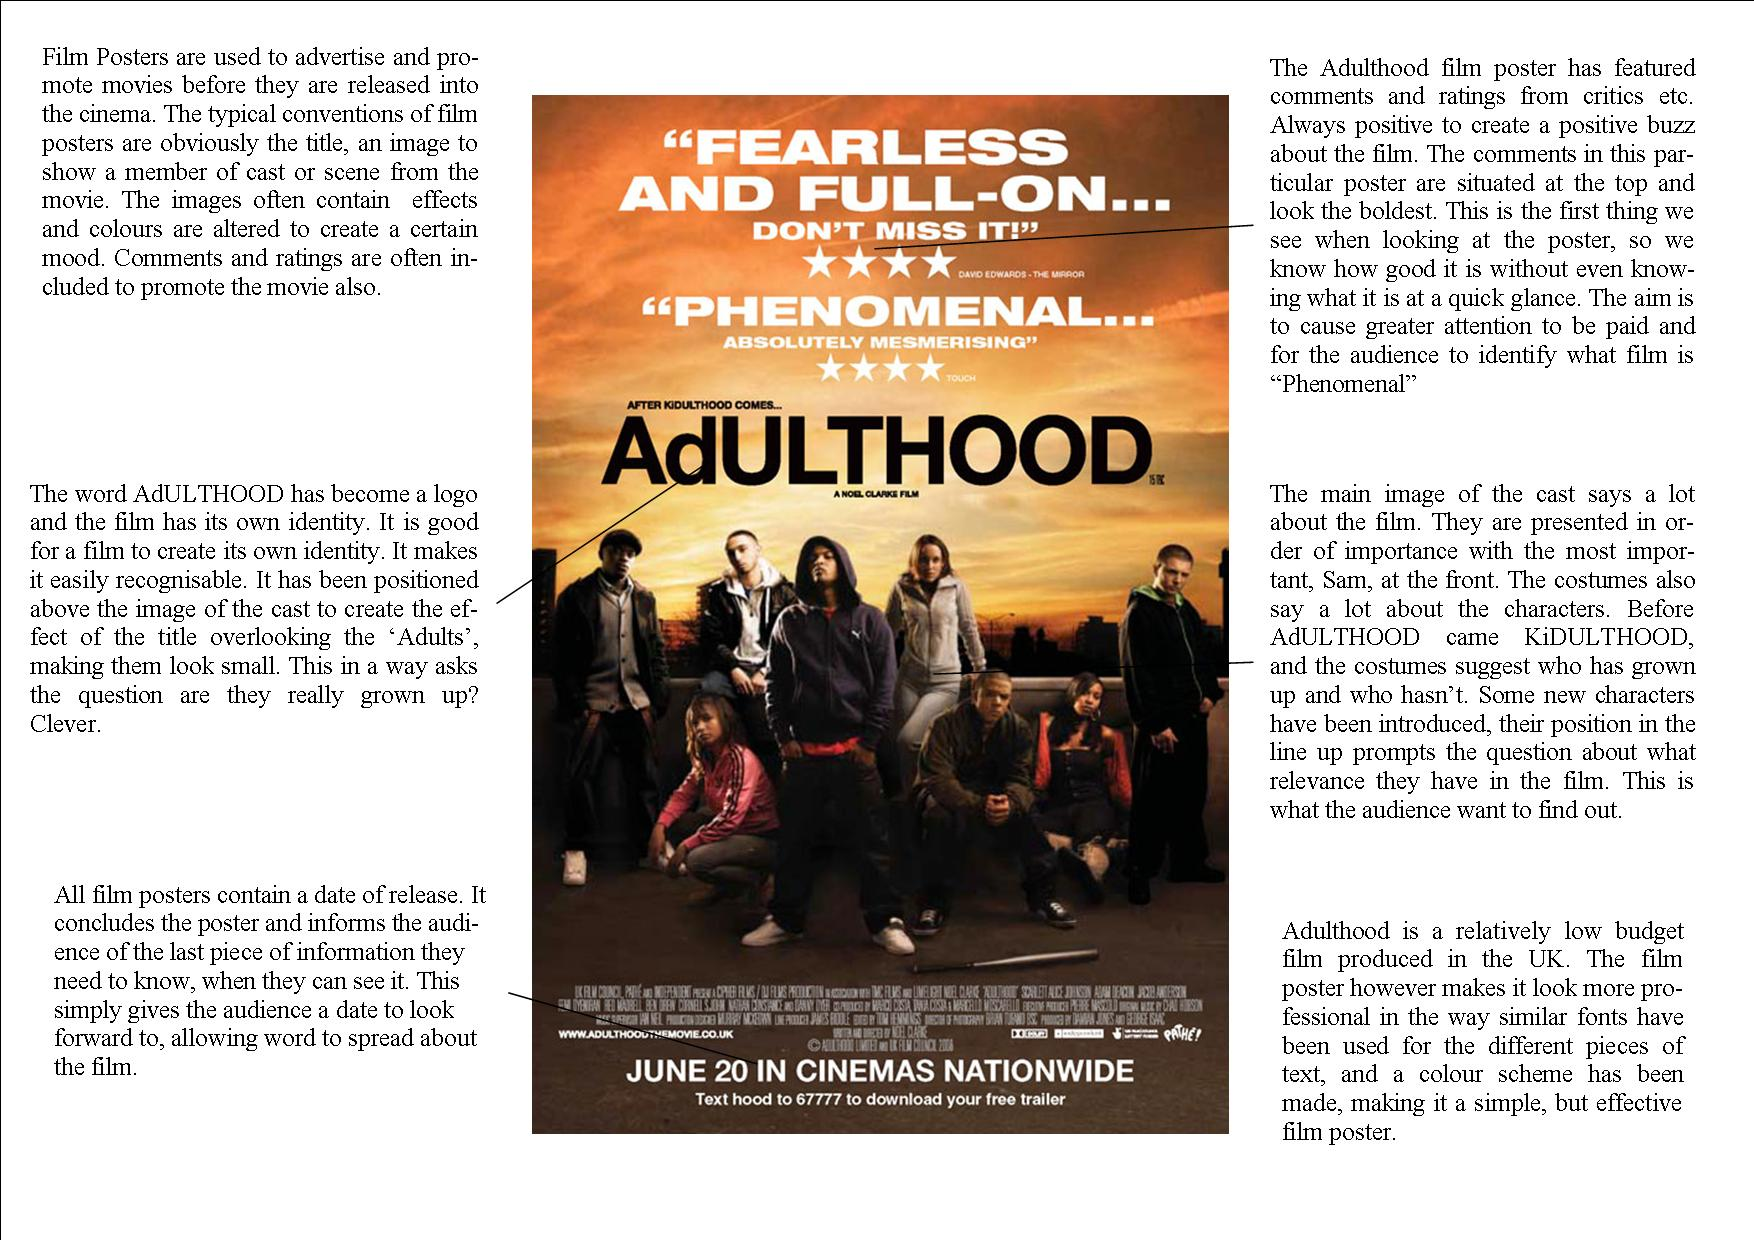 Adulthood Film Posterysis